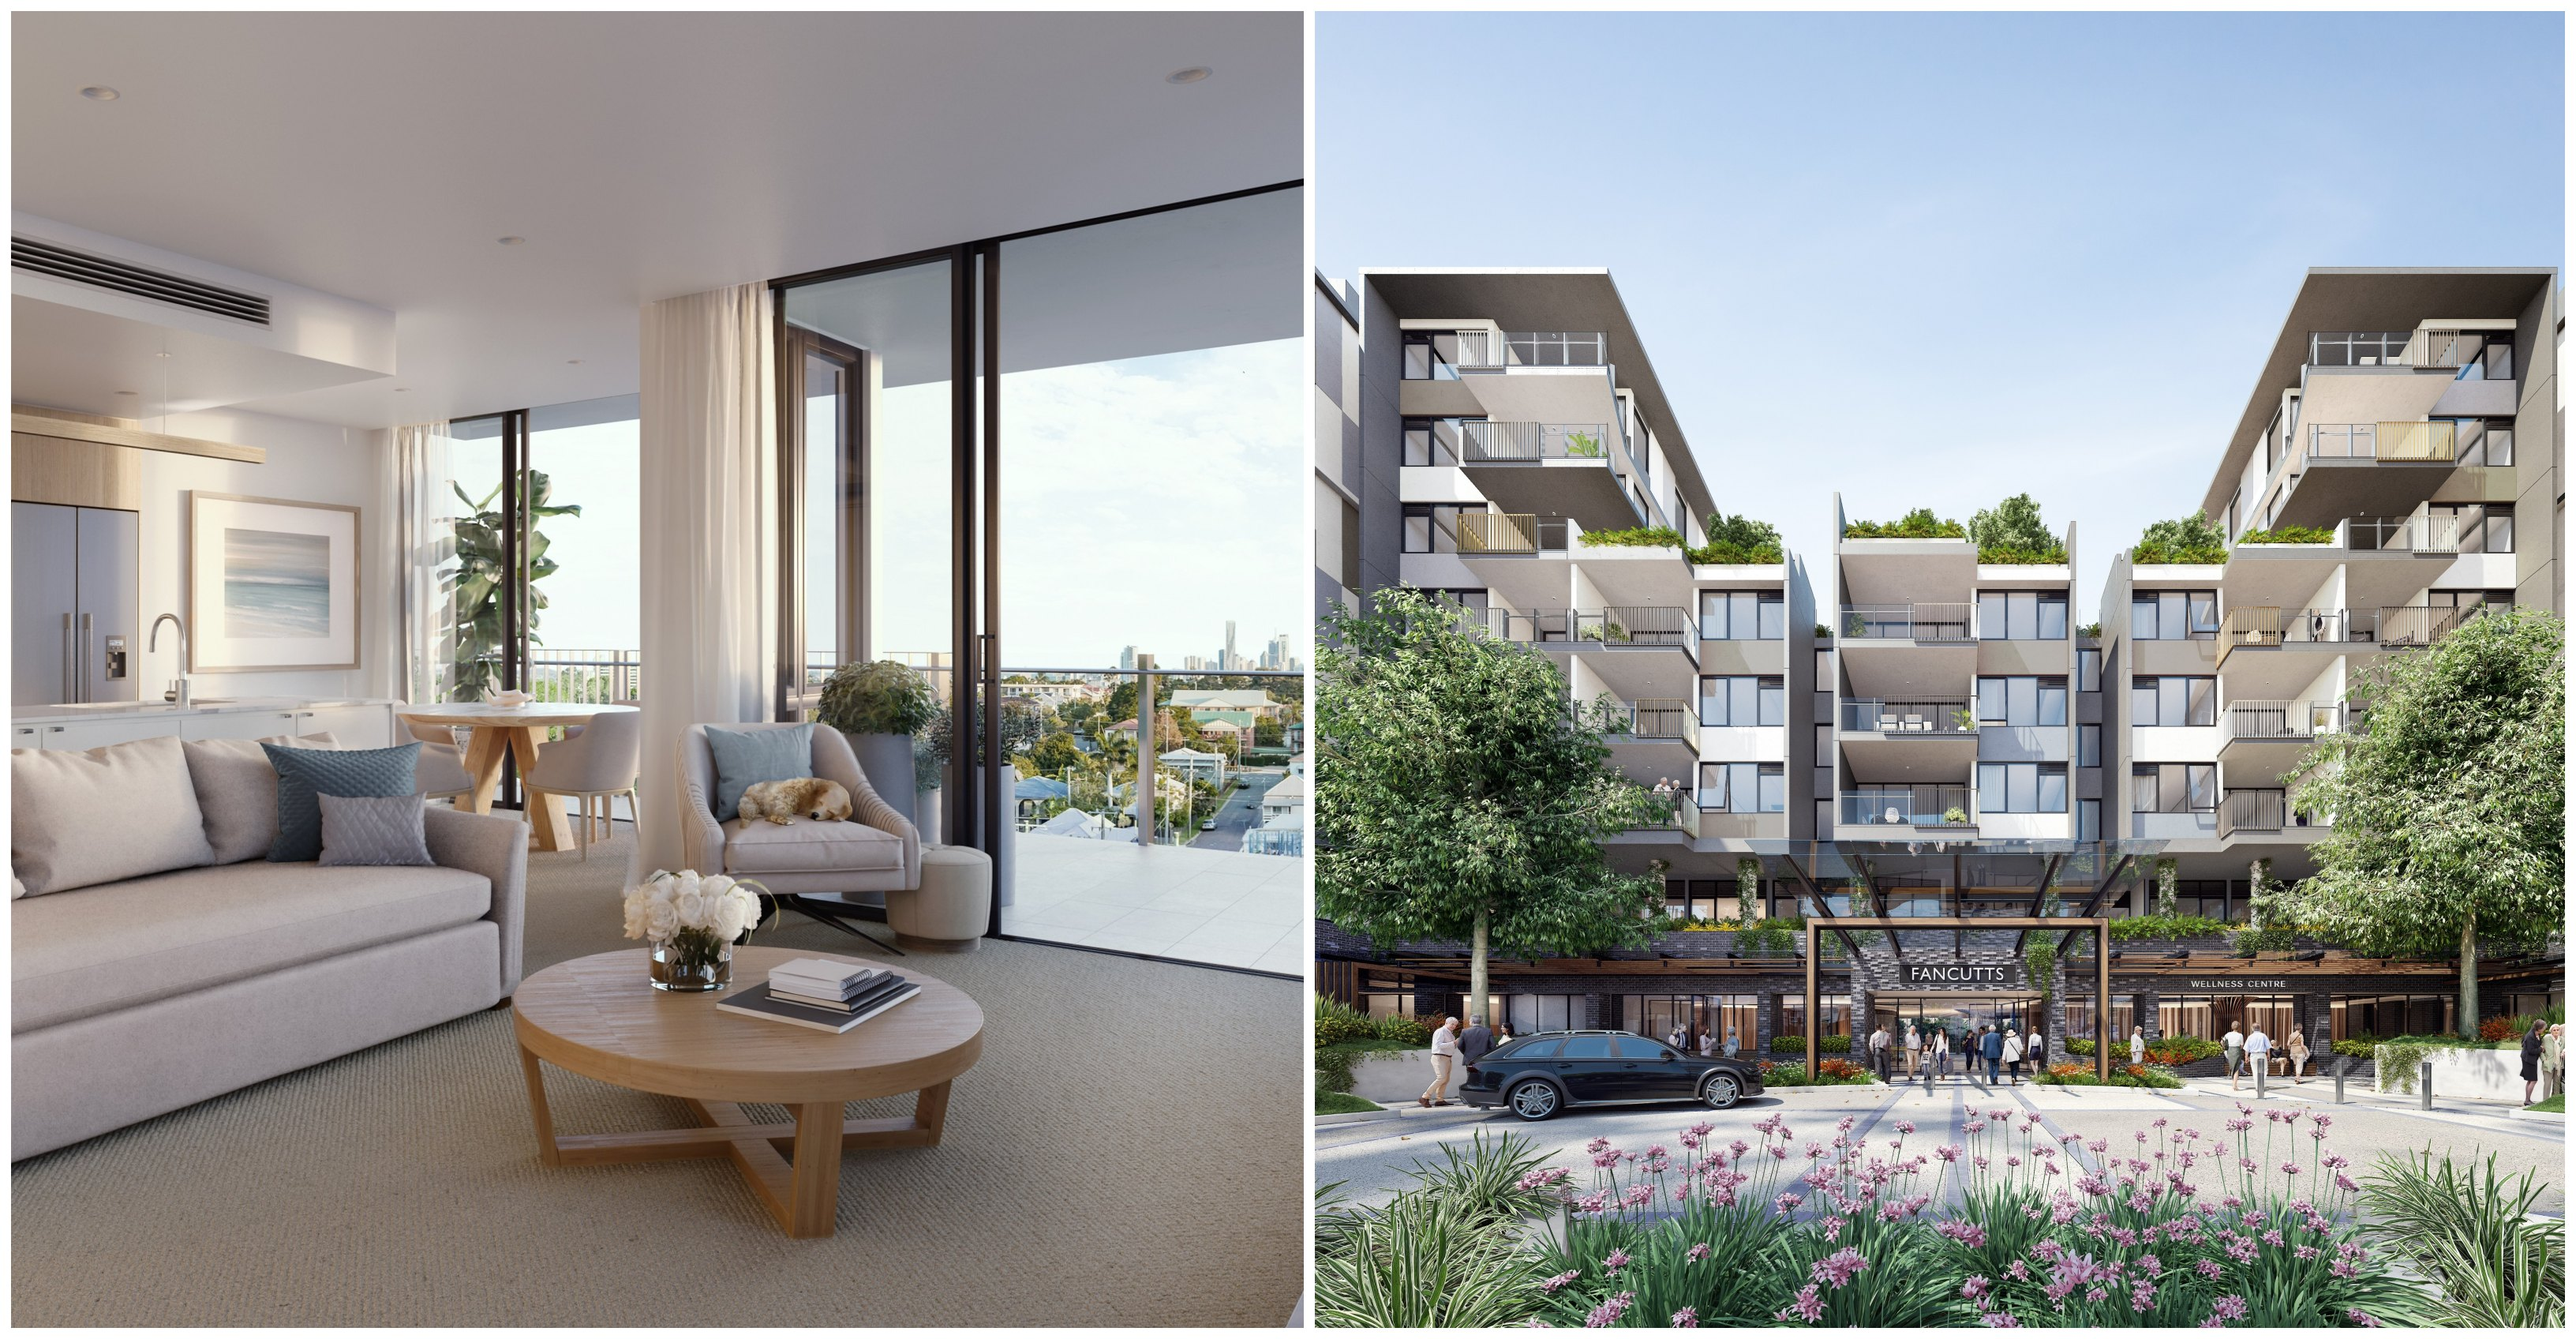 RetireAustralia's plans for a vertical retirement village set on the Fancutts Tennis Centre site in Brisbane's inner-north.